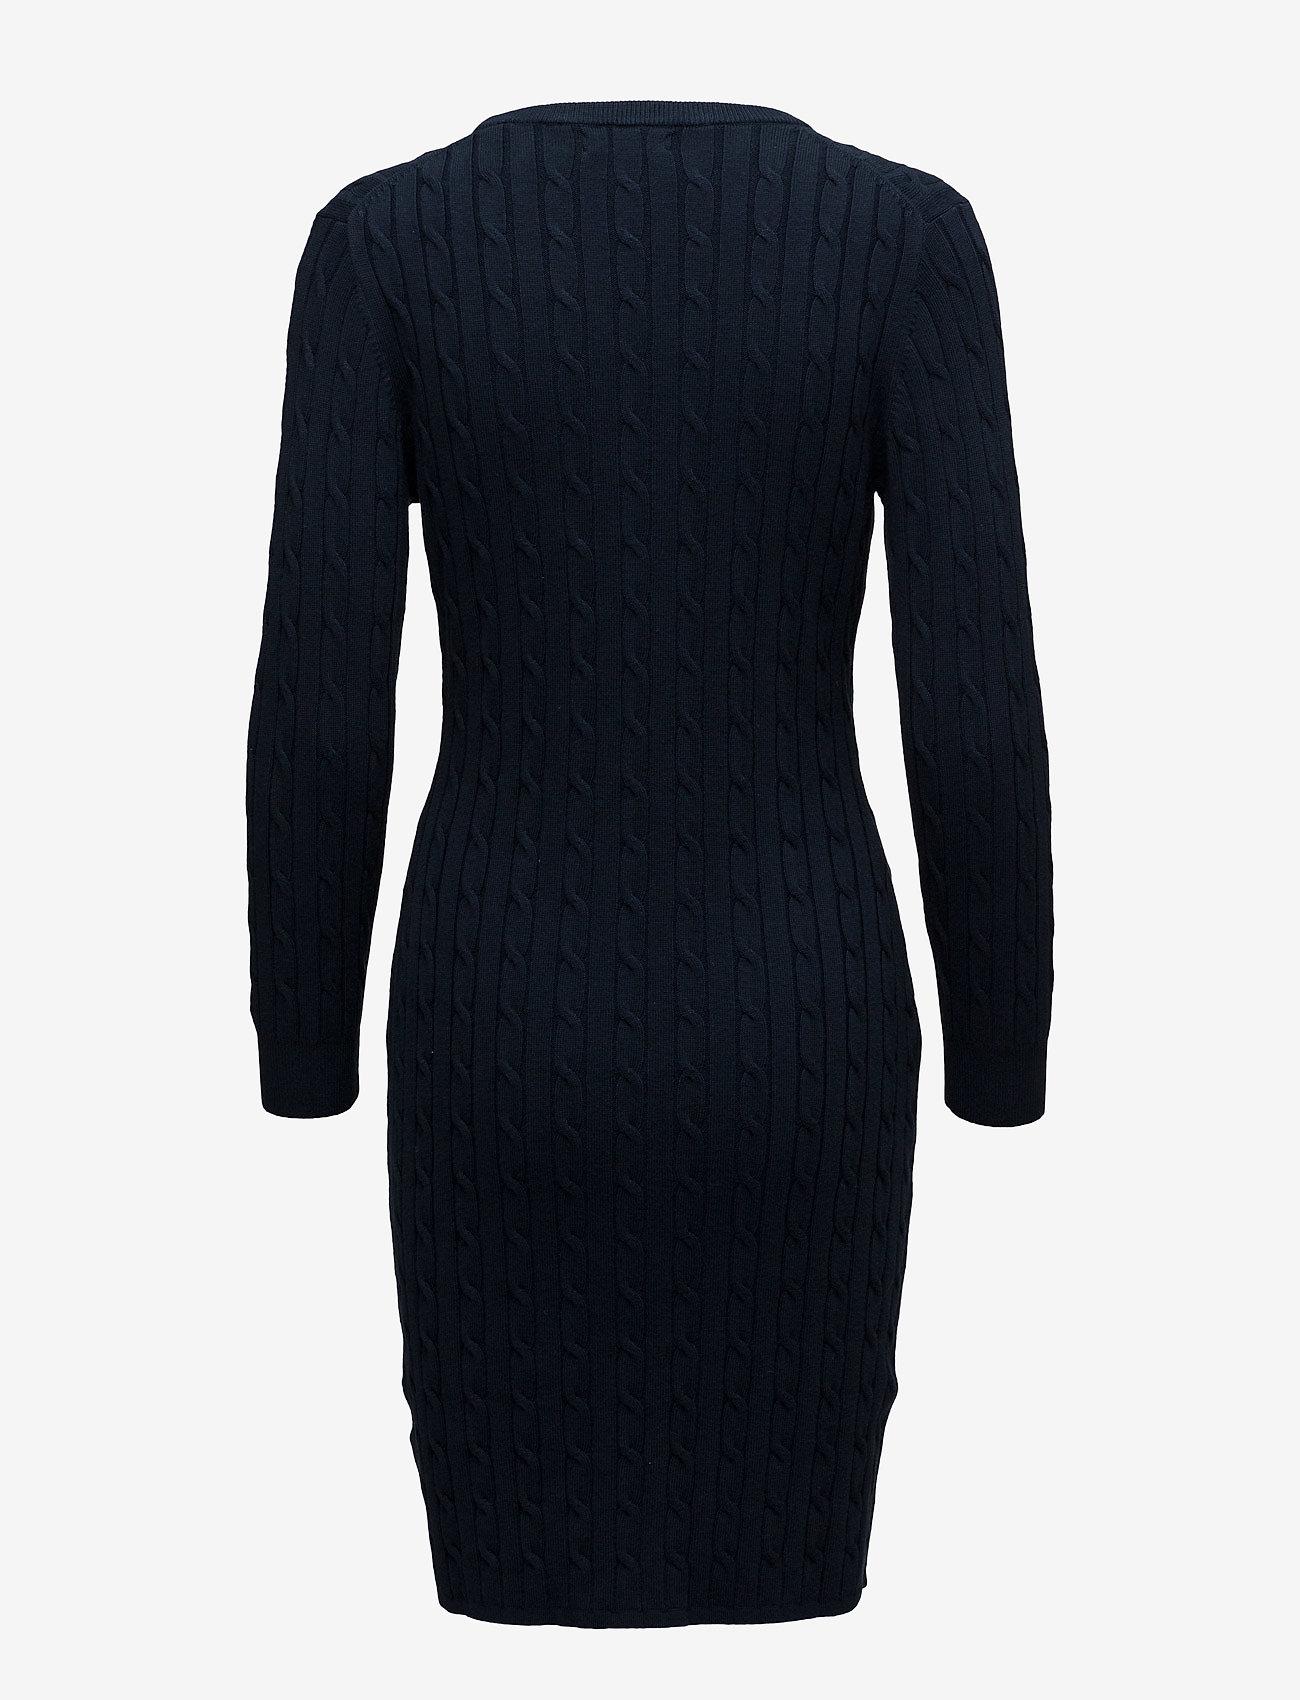 GANT - STRETCH COTTON CABLE DRESS - bodycon kleitas - evening blue - 1